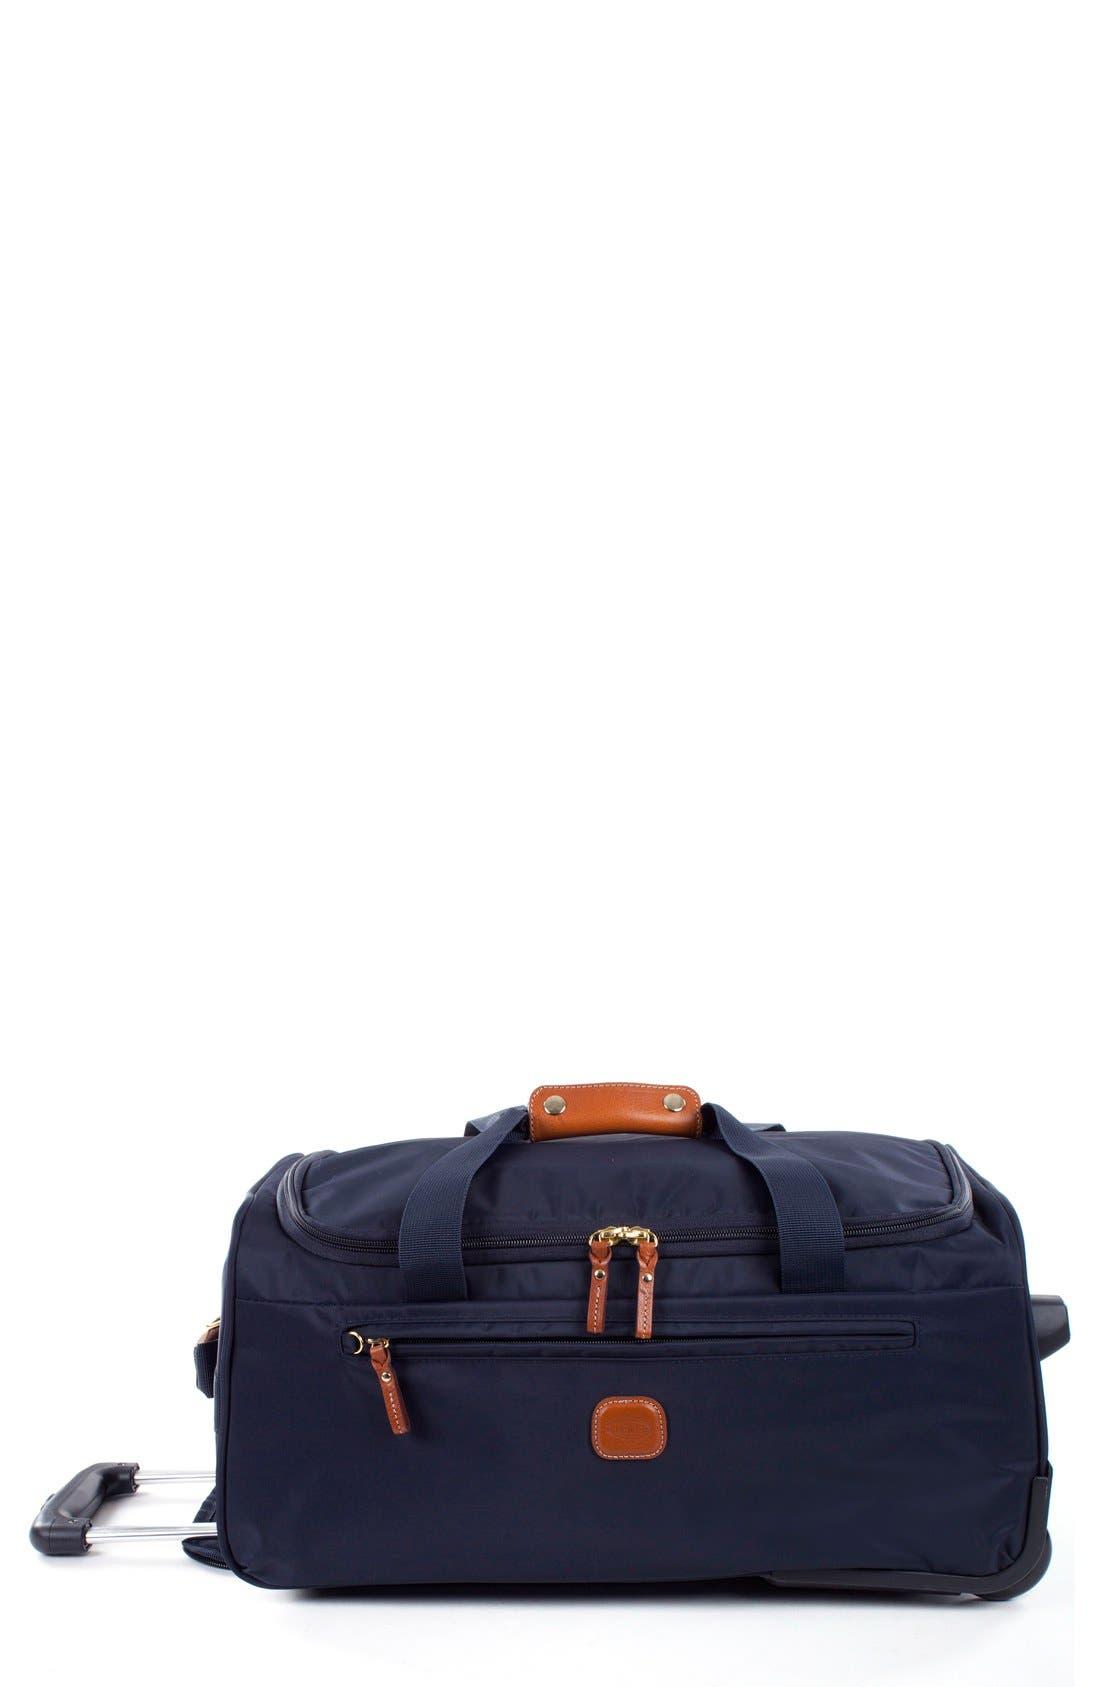 Brics X-Bag 21-Inch Rolling Carry-On Duffle Bag